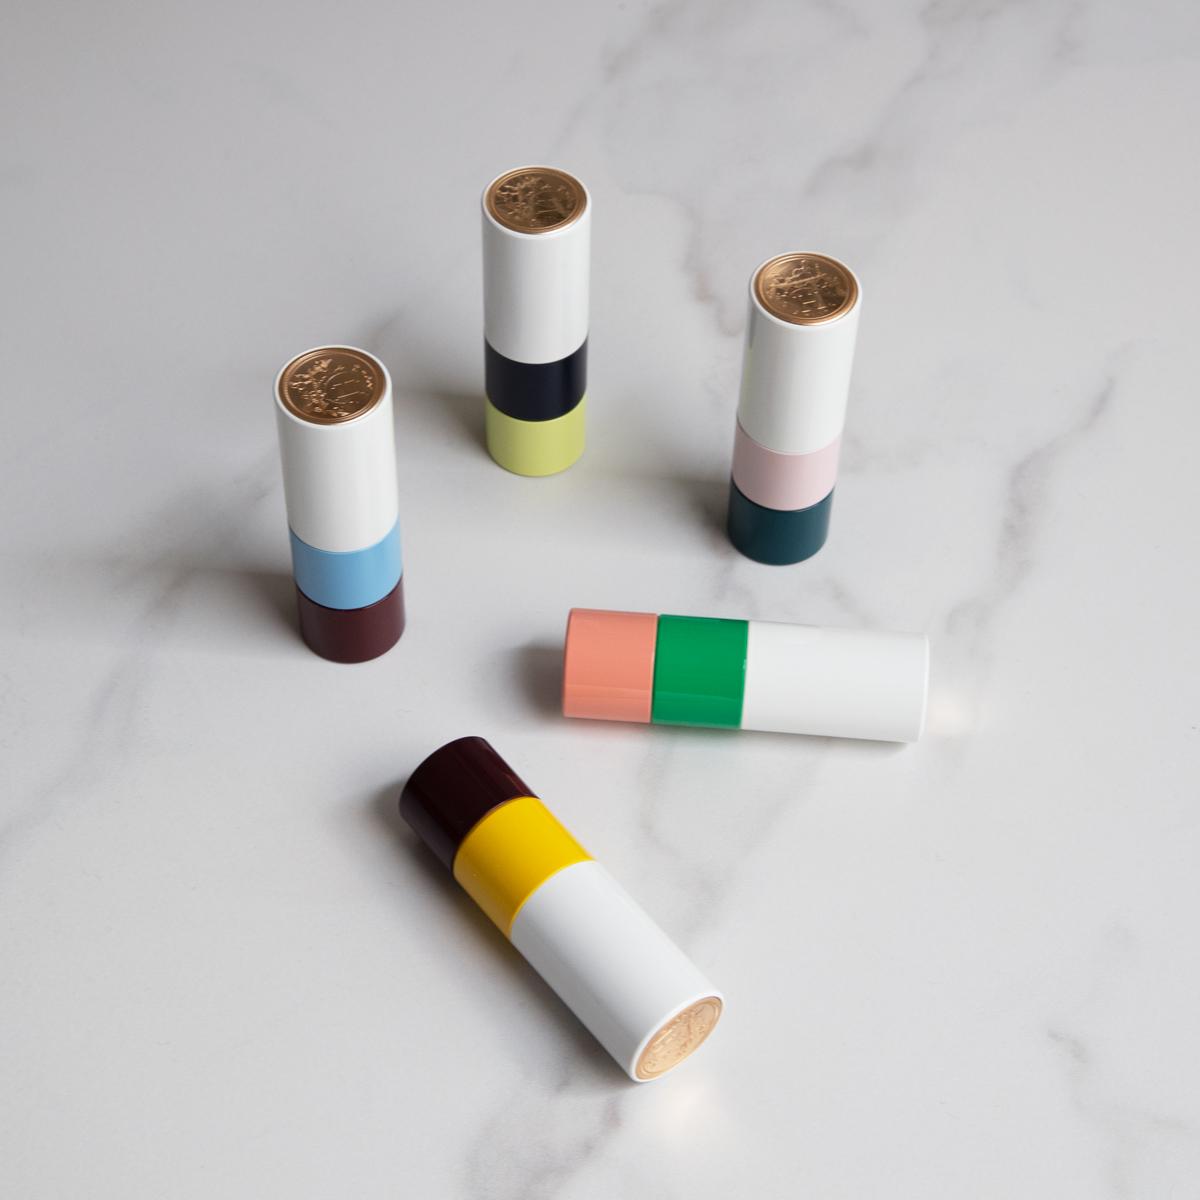 Hermès lipsticks